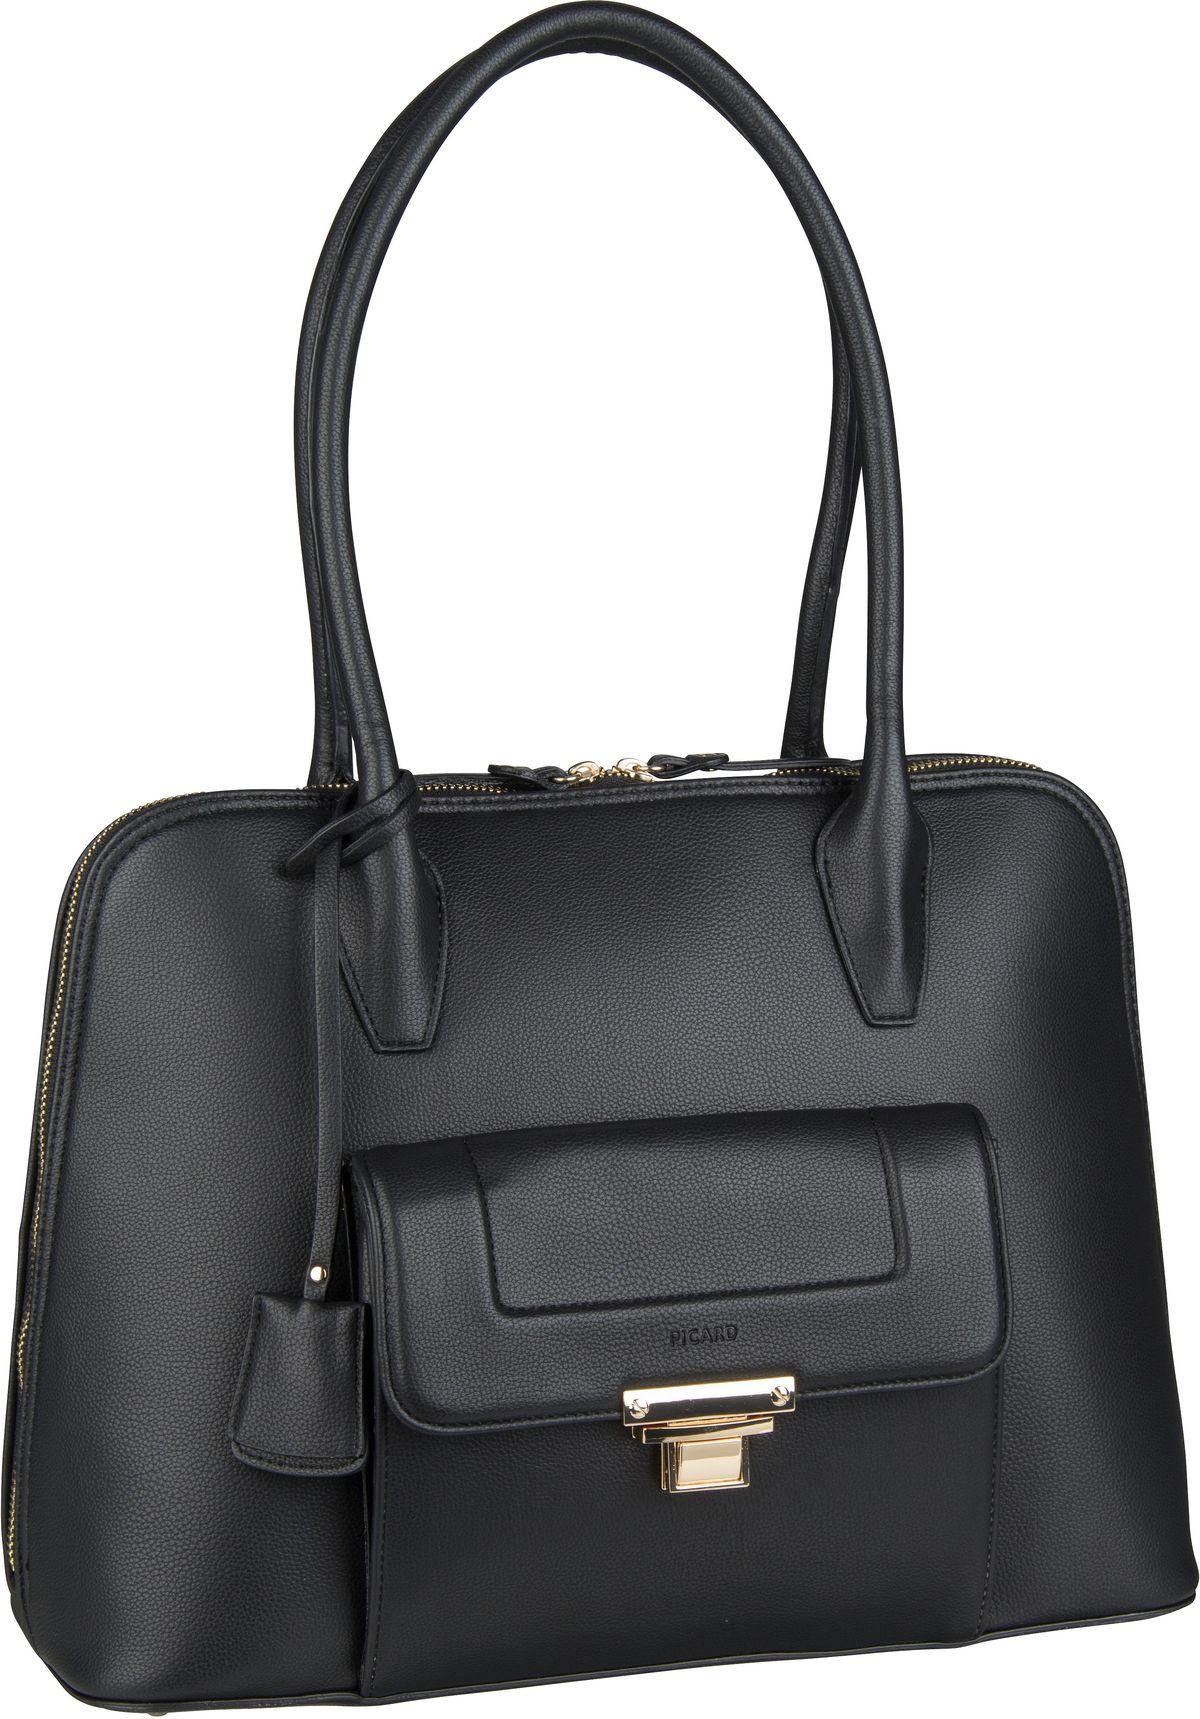 Handtasche Megan 9527 Schwarz